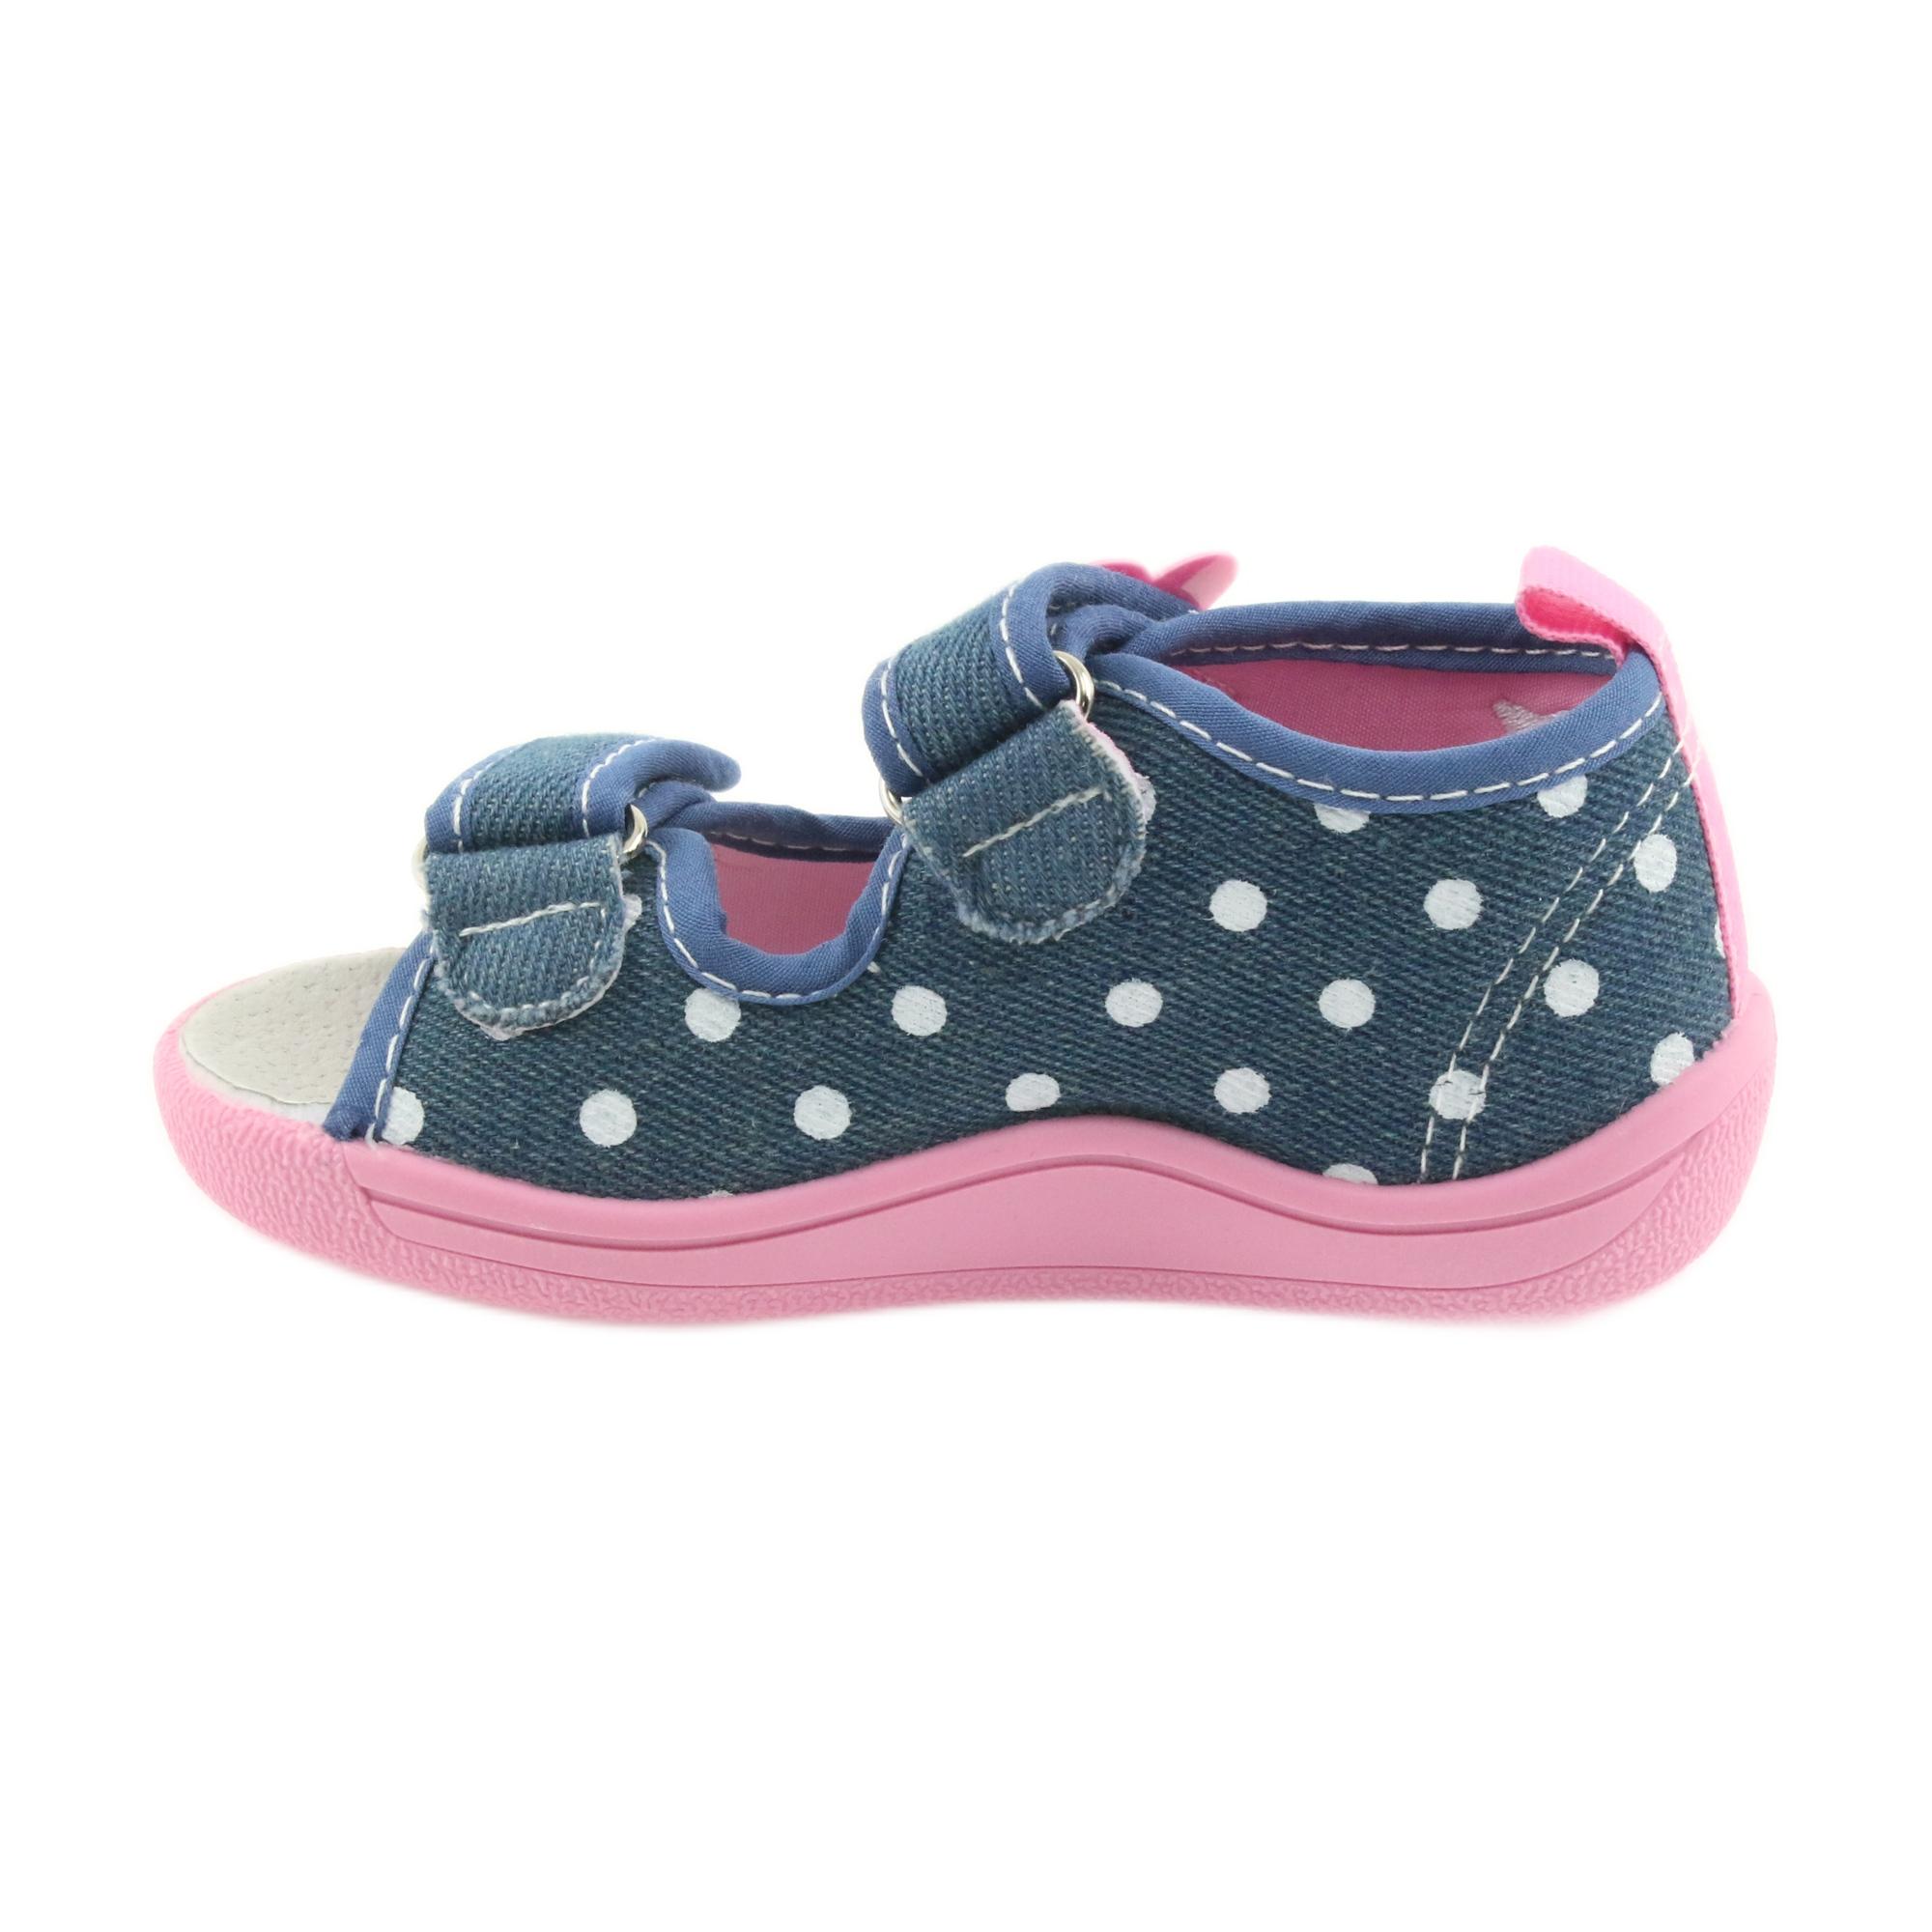 0fee4c3e American Club Børns sko tøfler sandaler jeans amerikanske kitty 39/19  billede 2